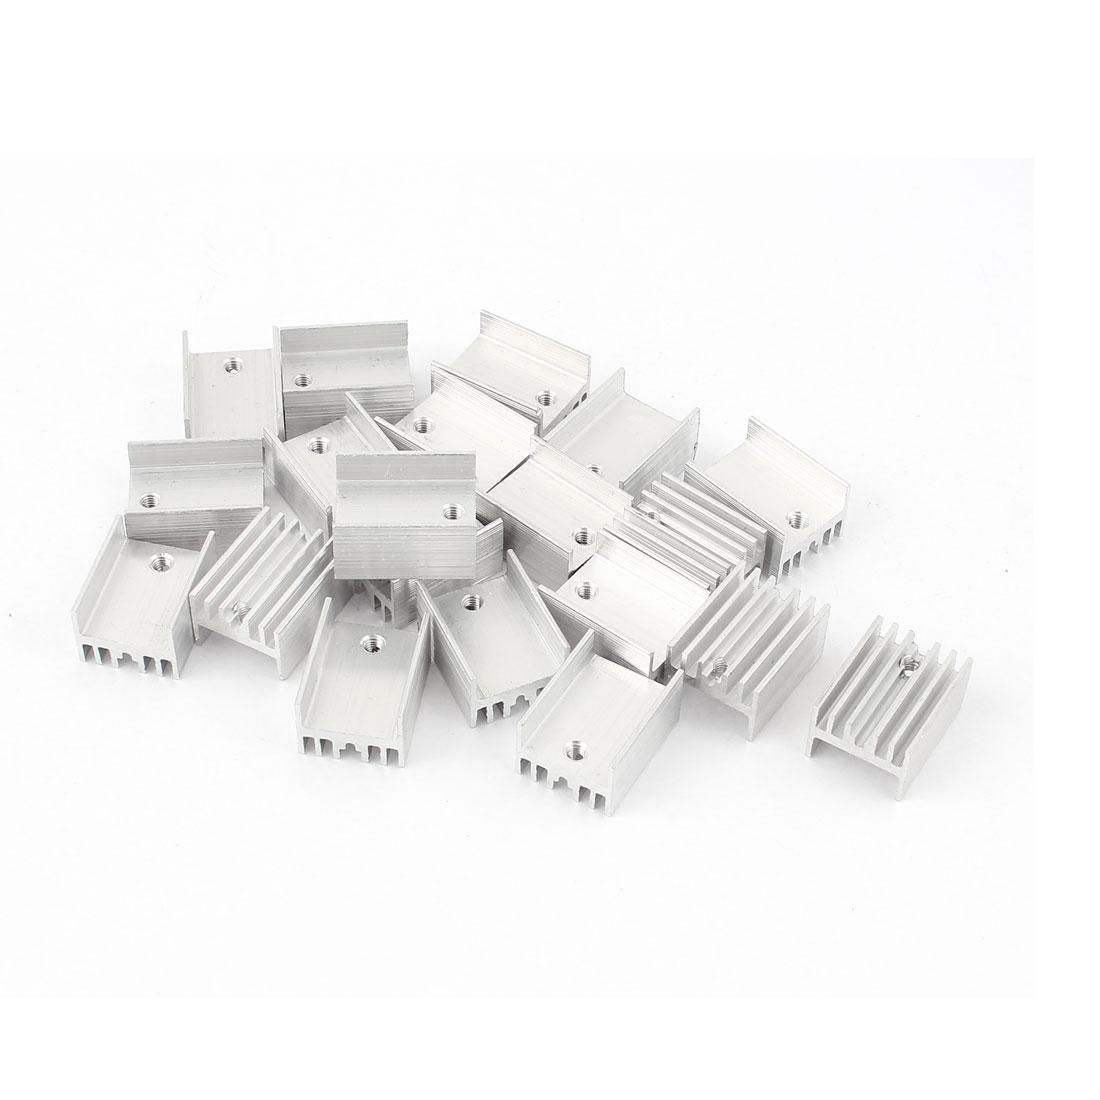 20 Pcs Aluminum Heatsinks Radiator Cooling Fin Cooler 20x15x10mm Silver Tone